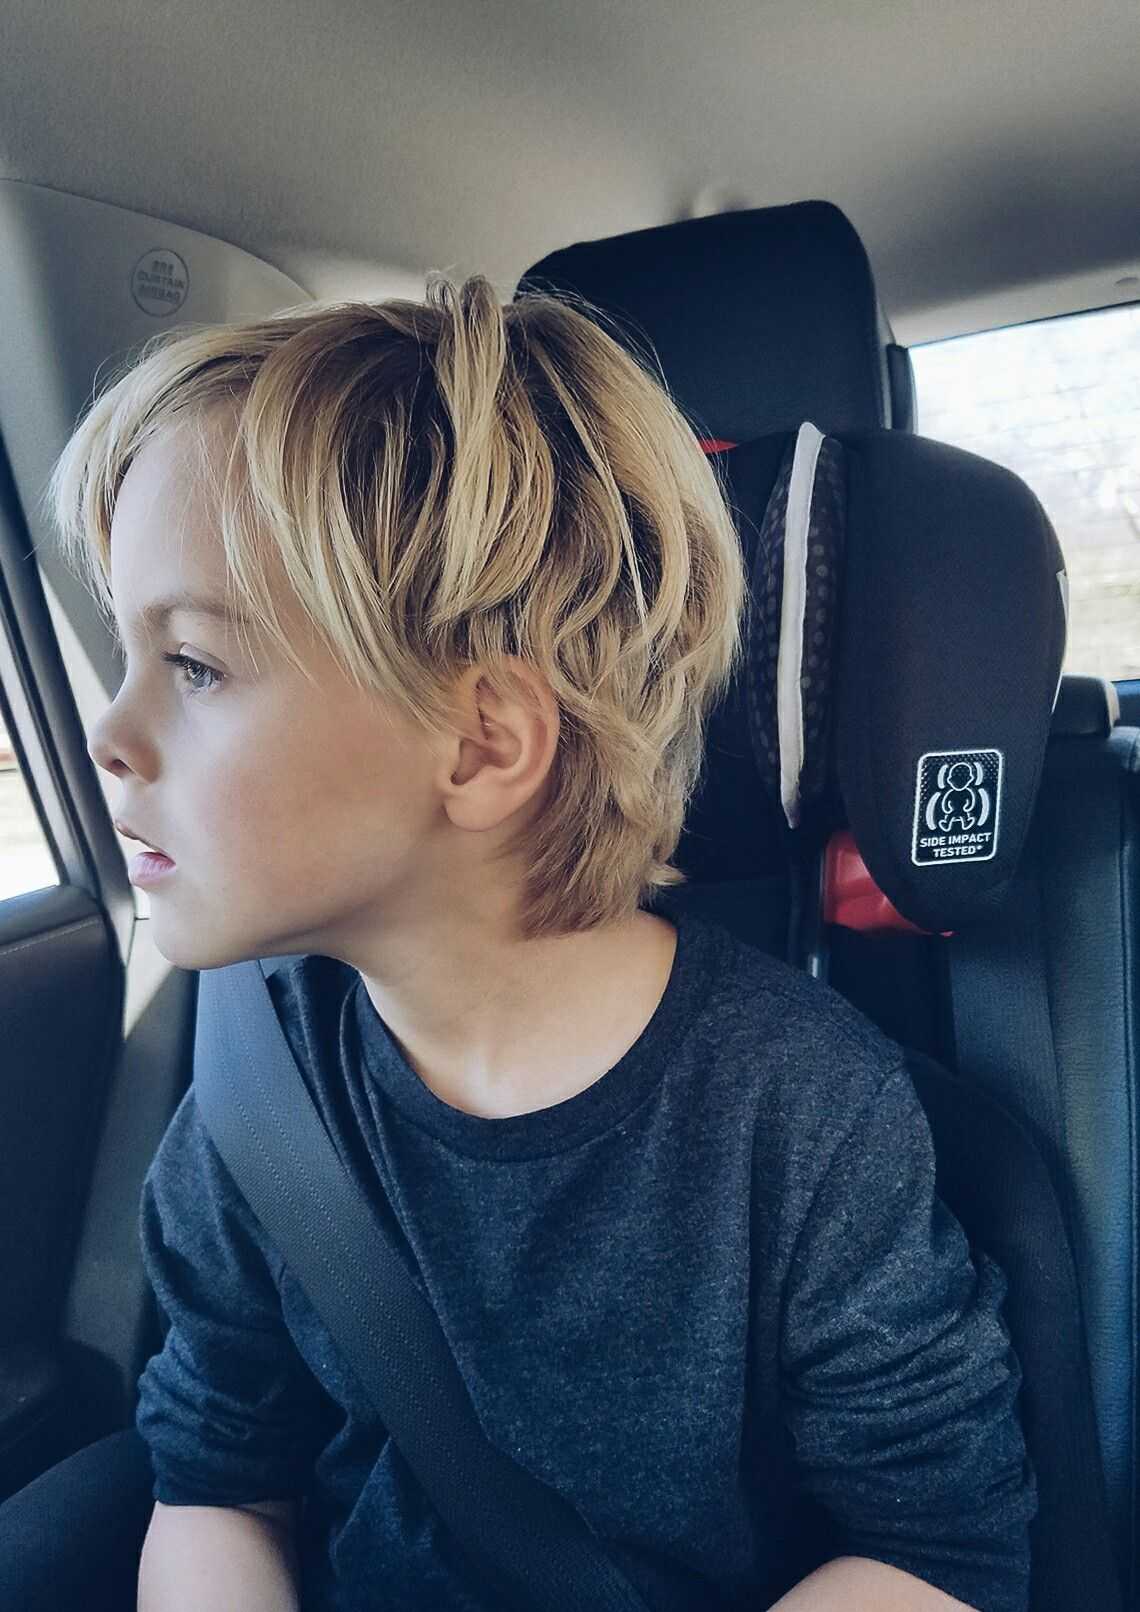 Boy hairstyle cutting 2018 loving this shaggy haircut  style  pinterest  hair cuts shaggy